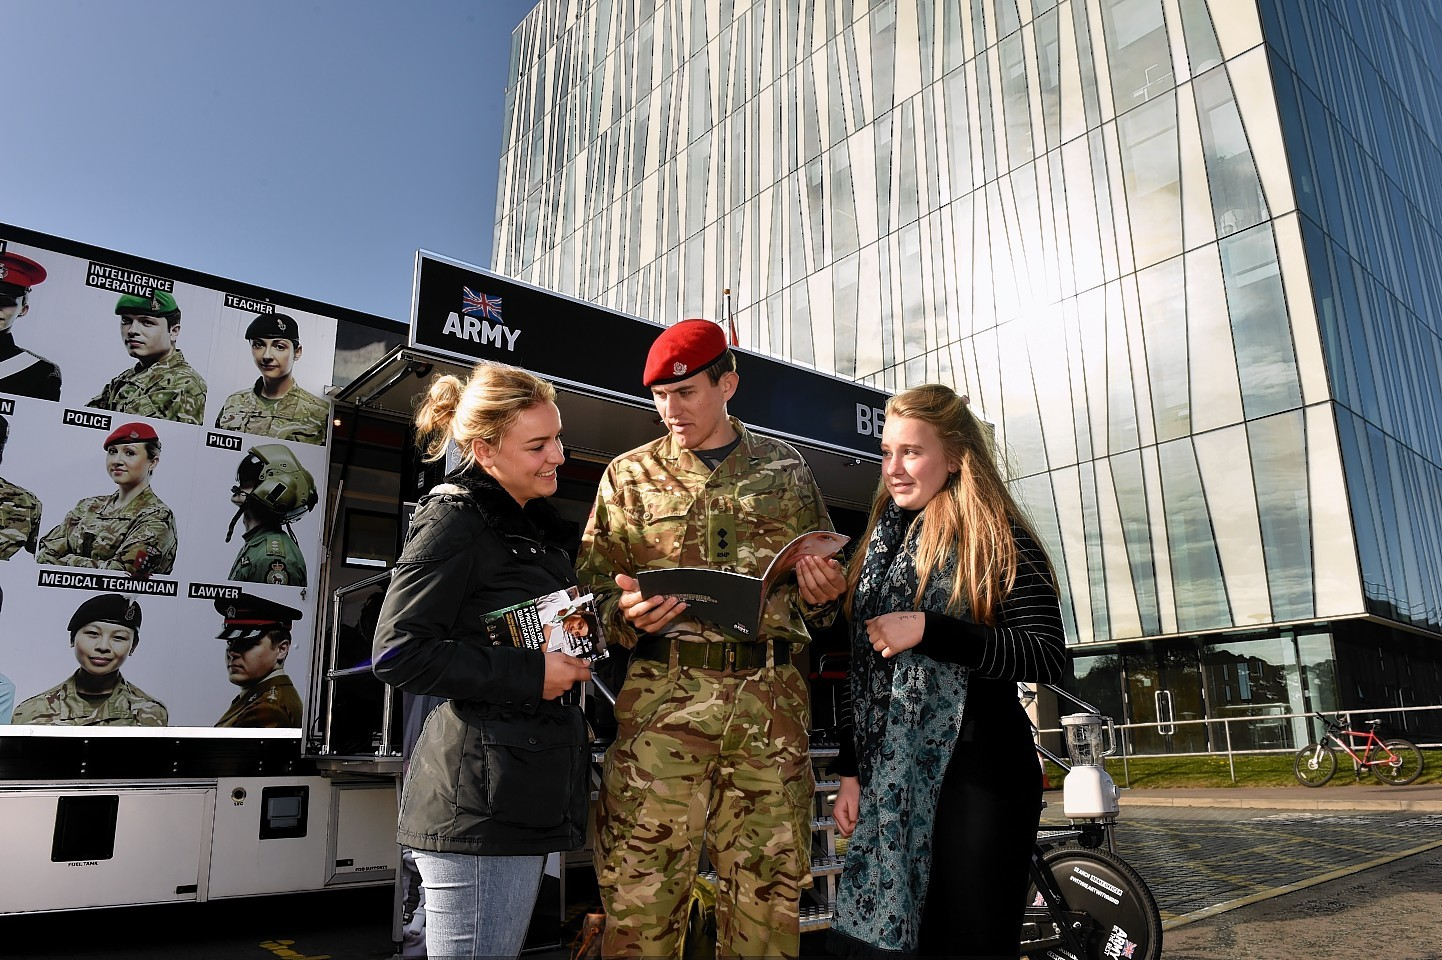 British Army recruitment at Aberdeen University